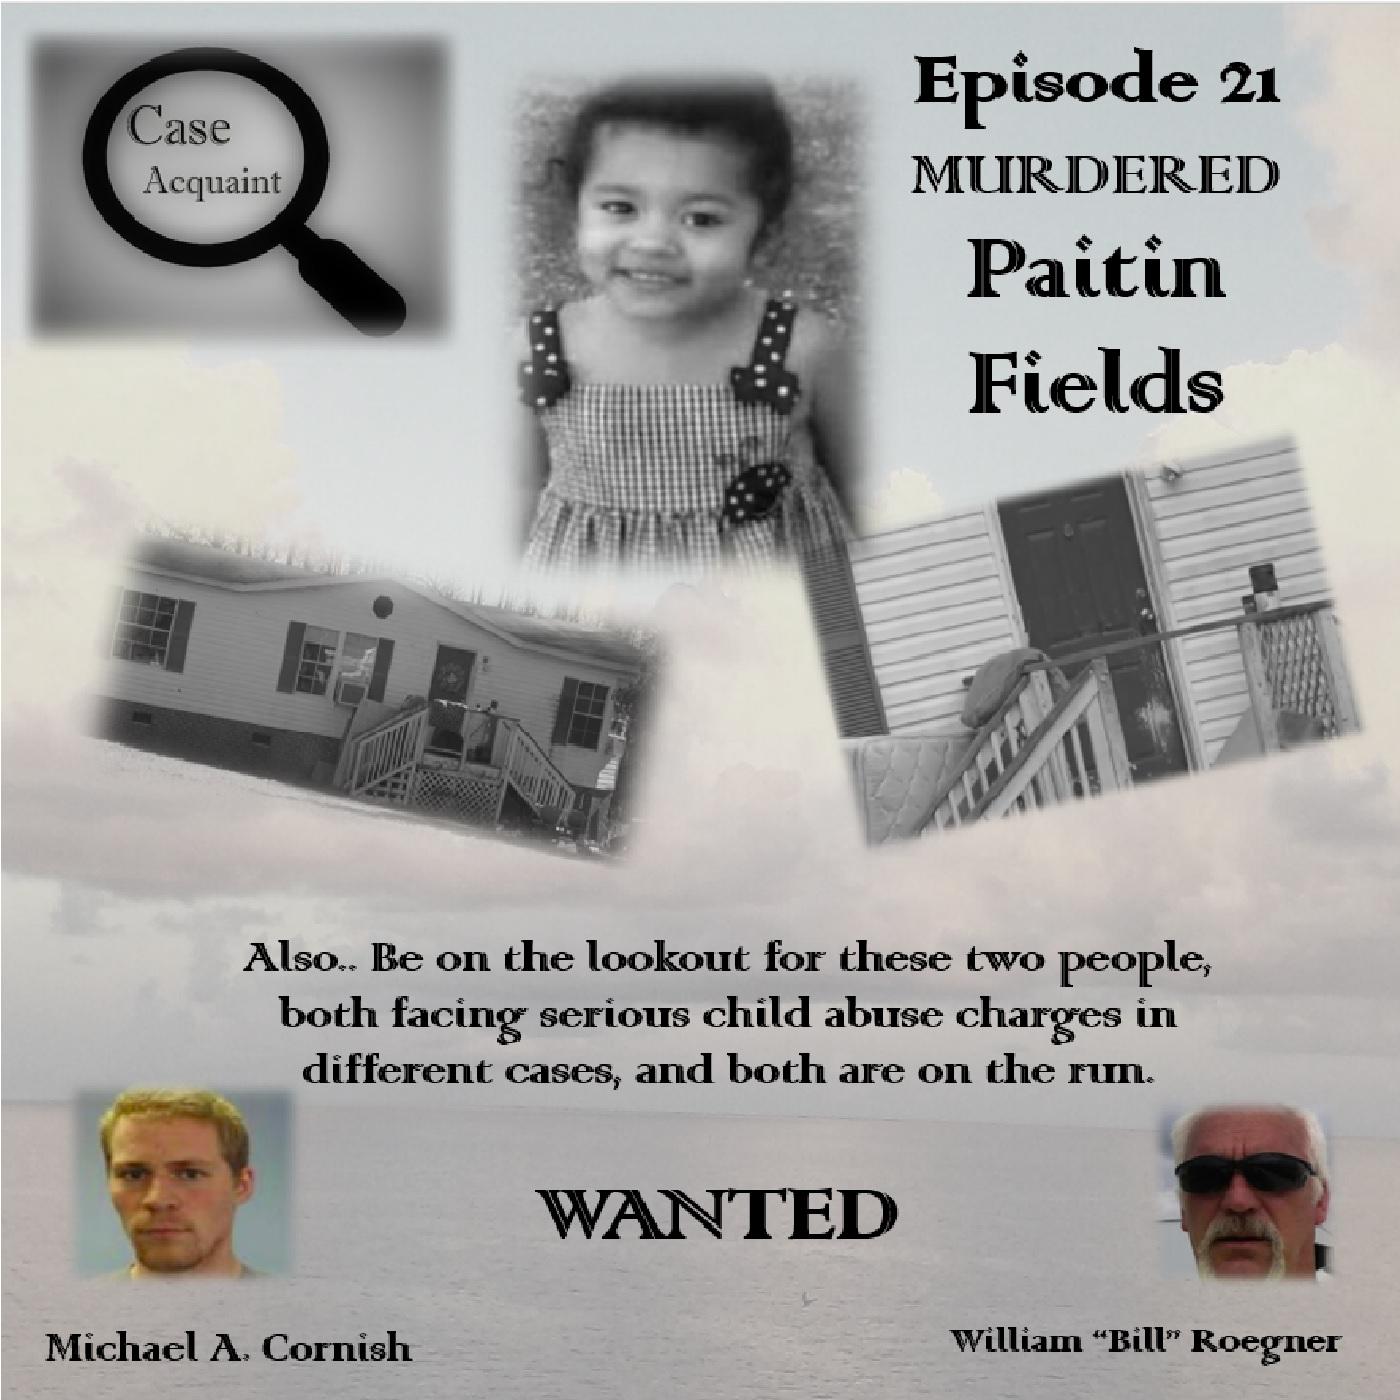 Episode 21 The Murder of Paitin Fields